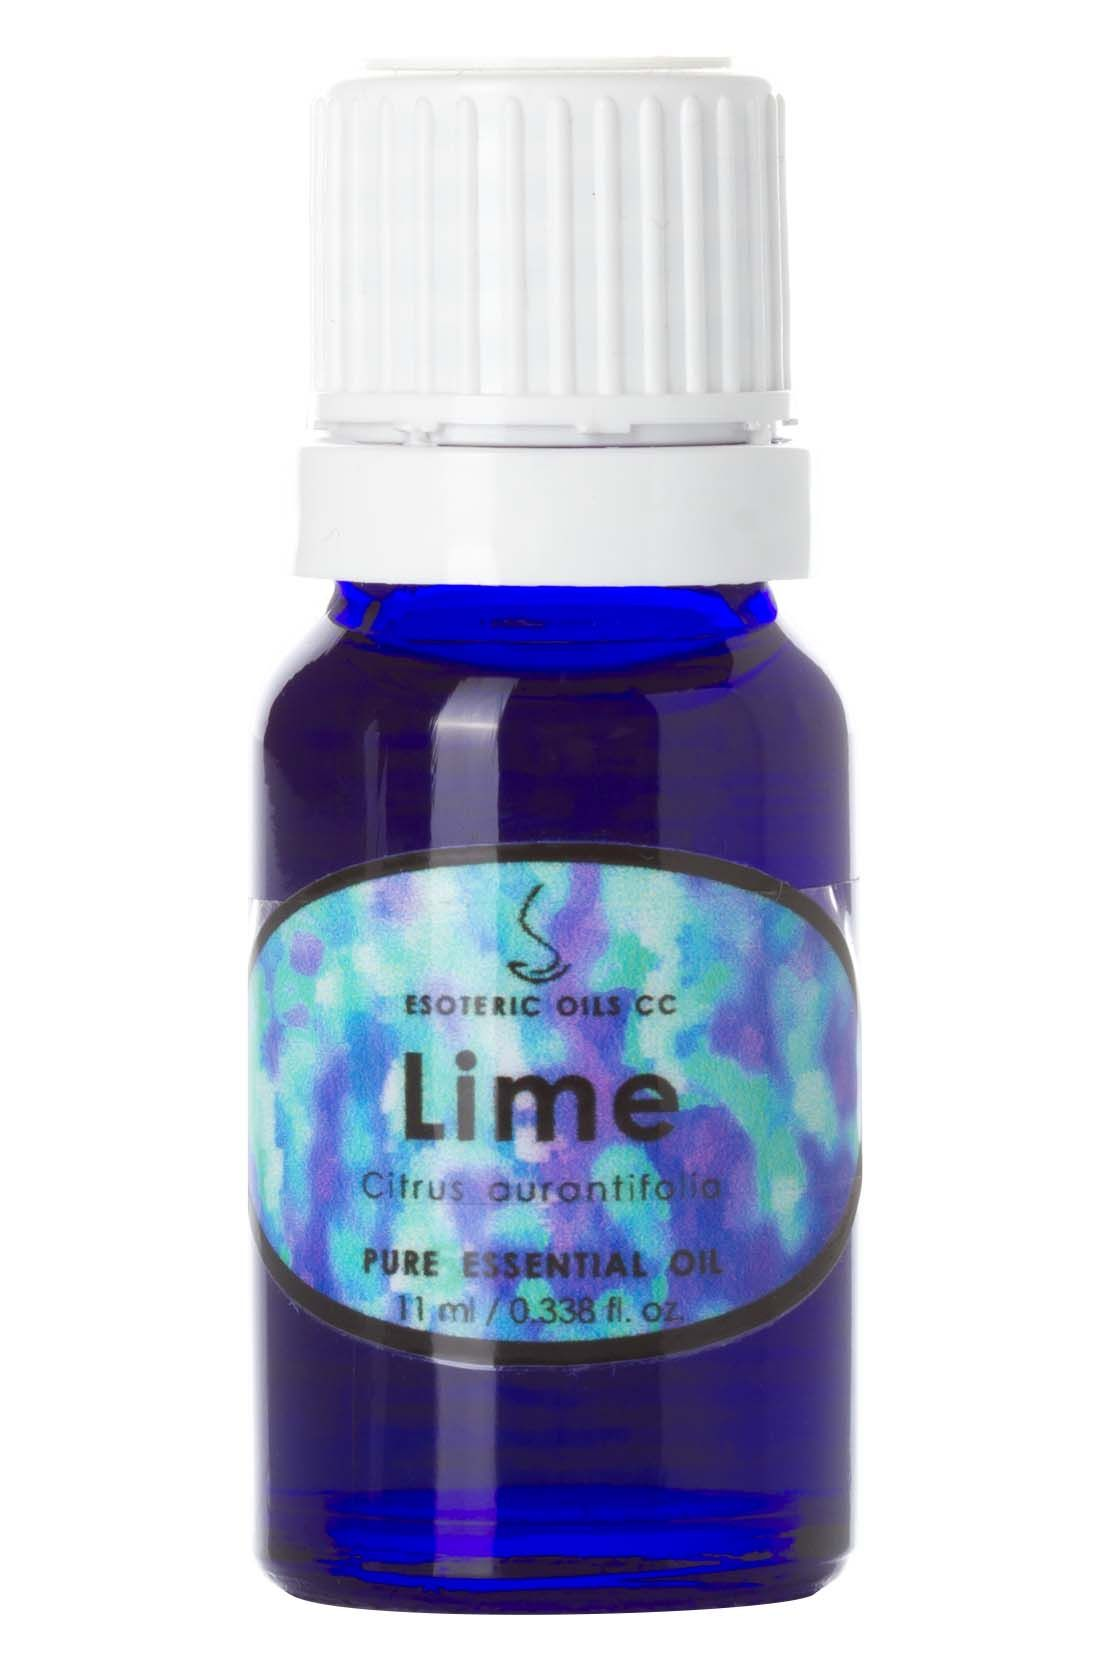 Lime oil (Citrus aurantifolia) - information on the origin